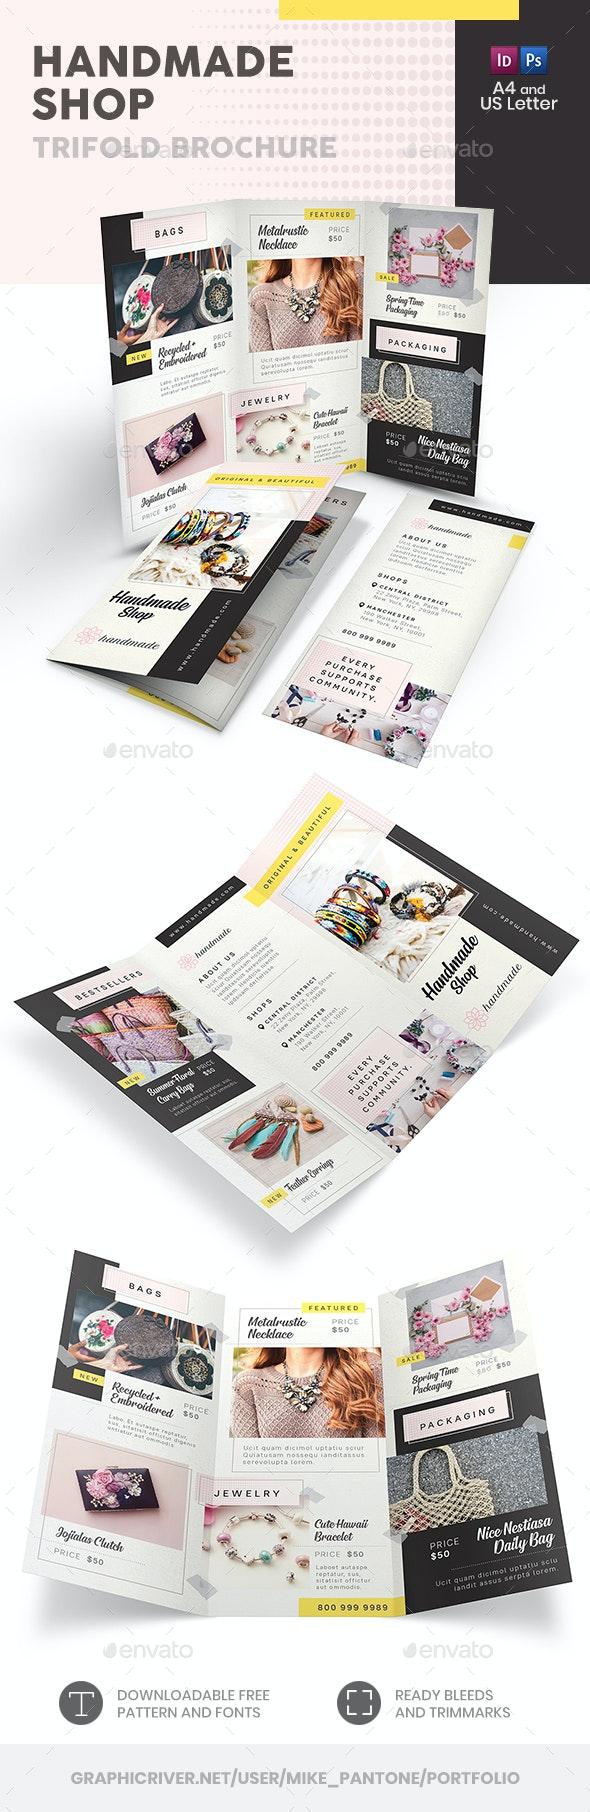 Handmade Shop Trifold Brochure 2 - Informational Brochures